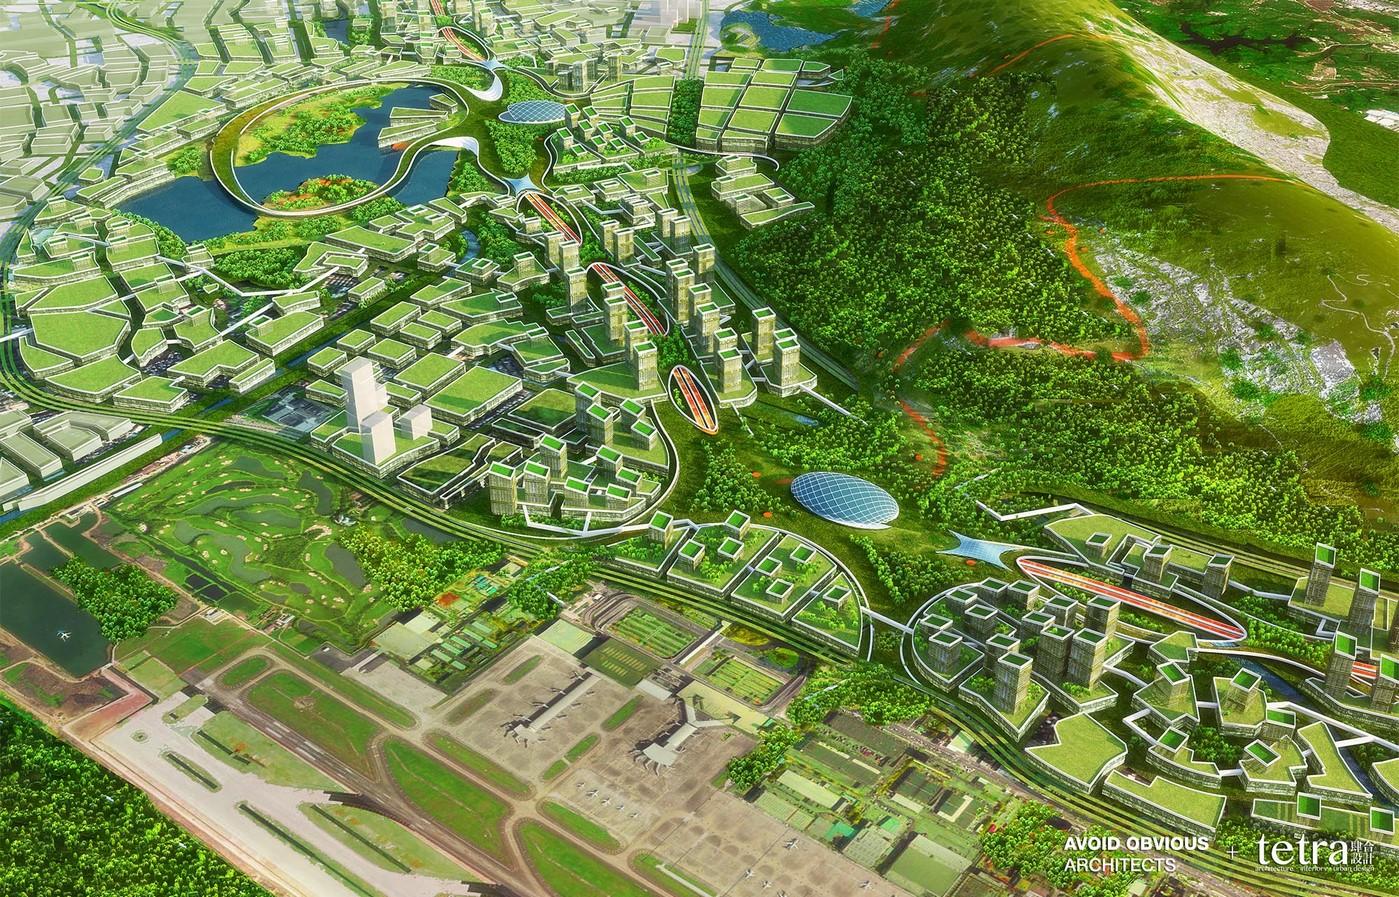 20 Futuristic projects in transportation design - Sheet4